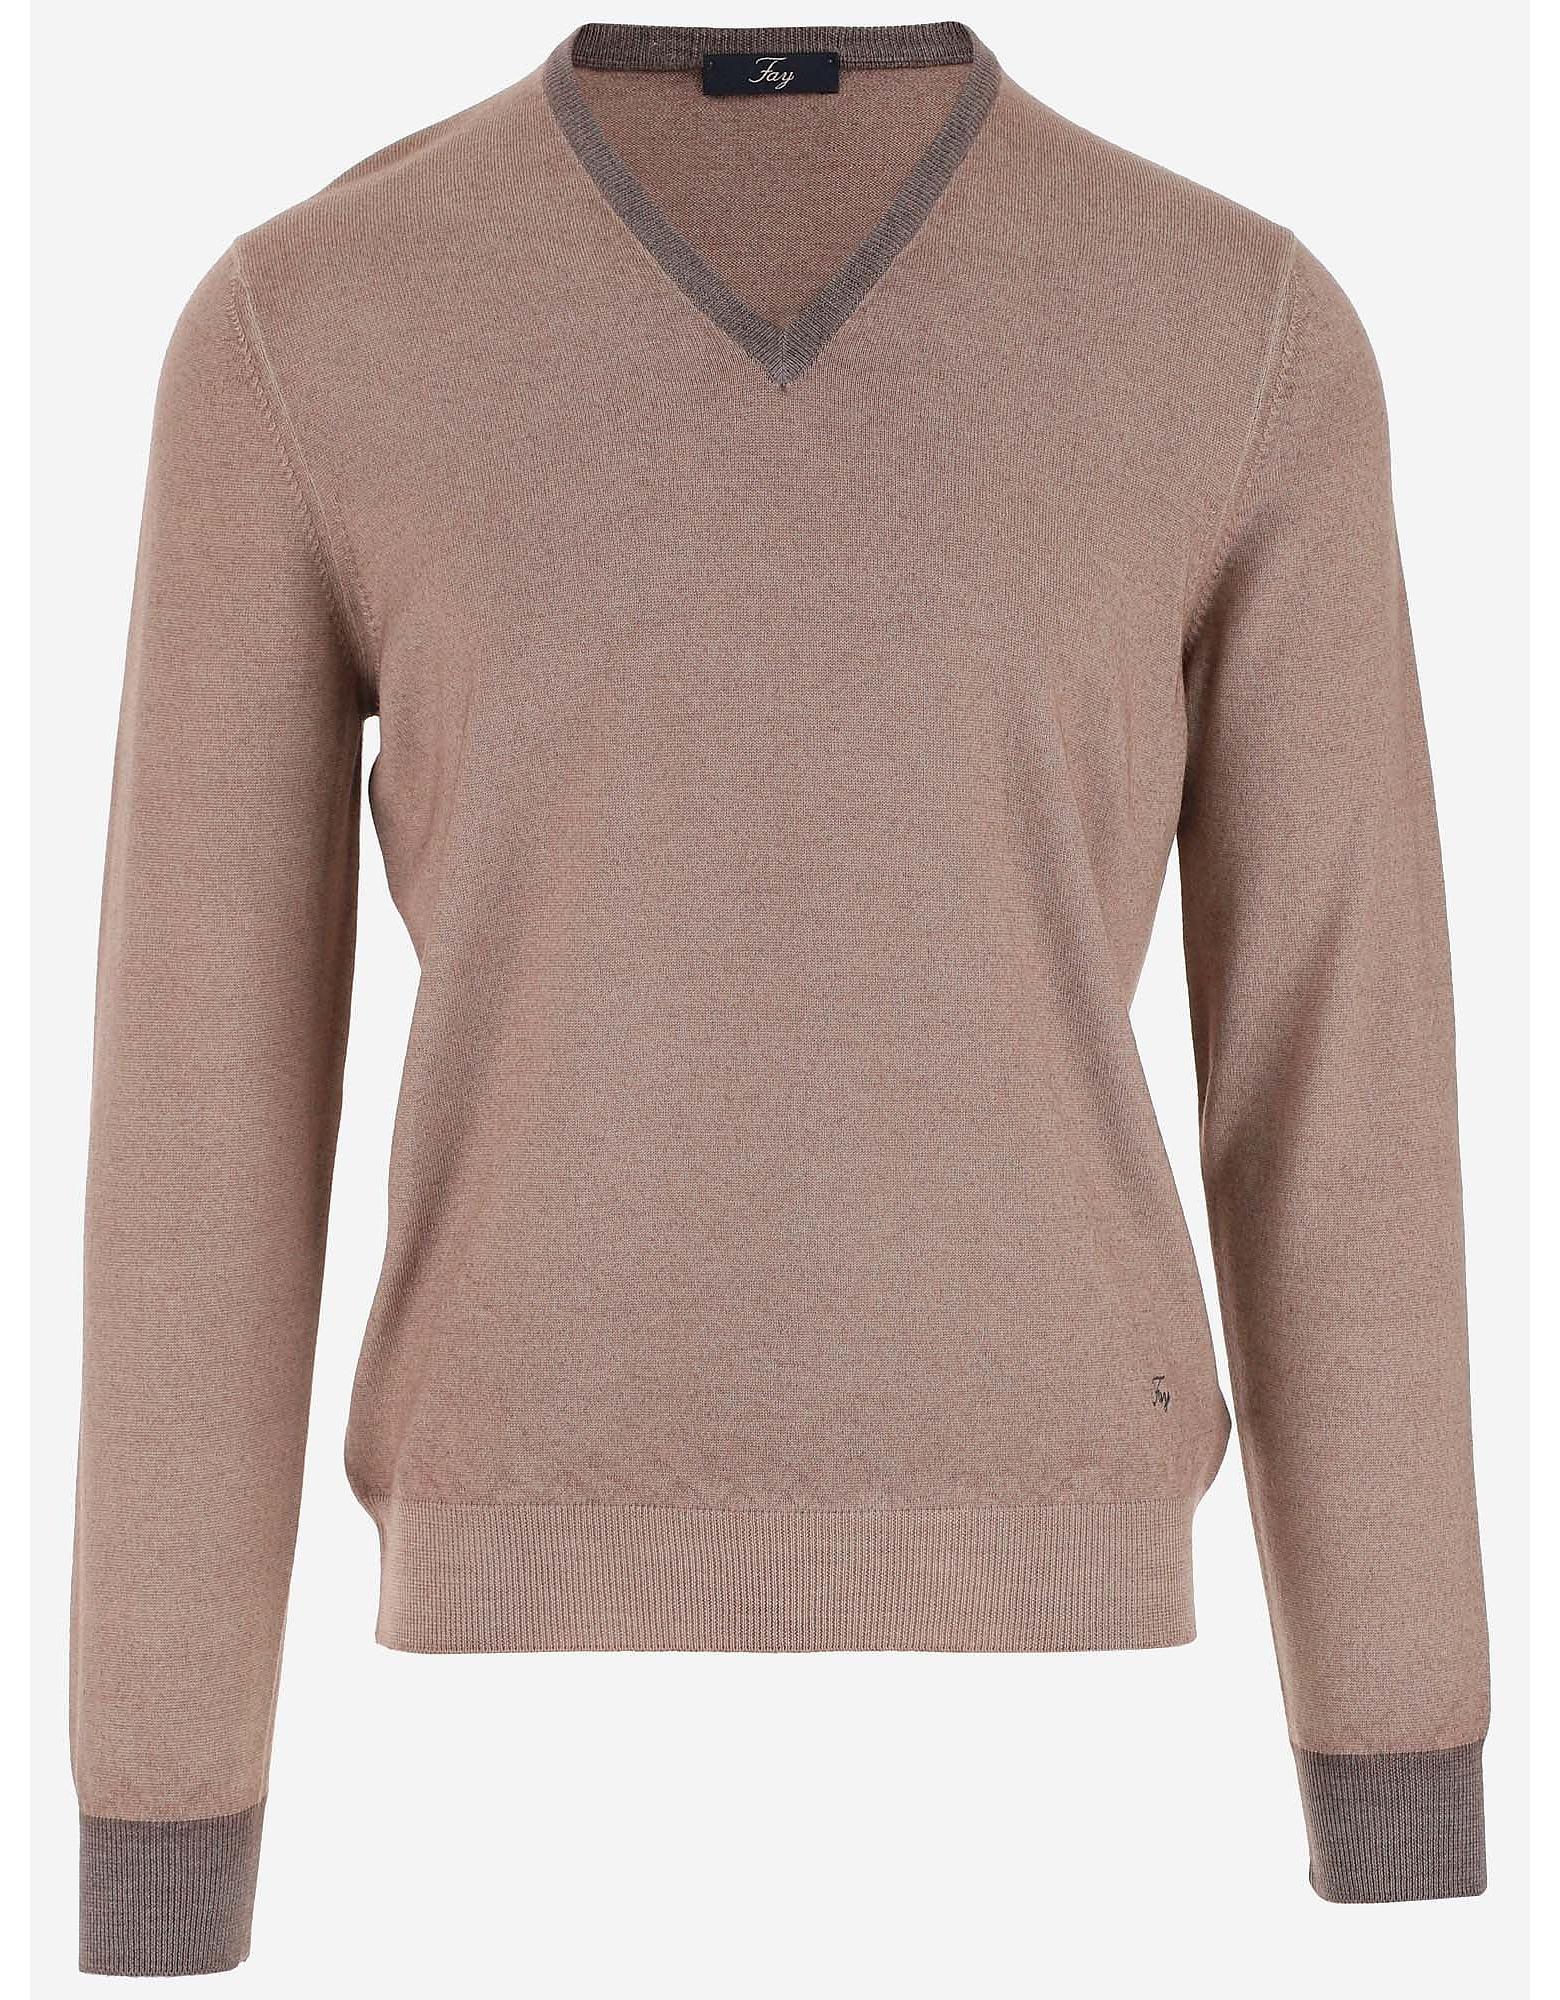 Fay Designer Knitwear, Men's Crewneck Sweater